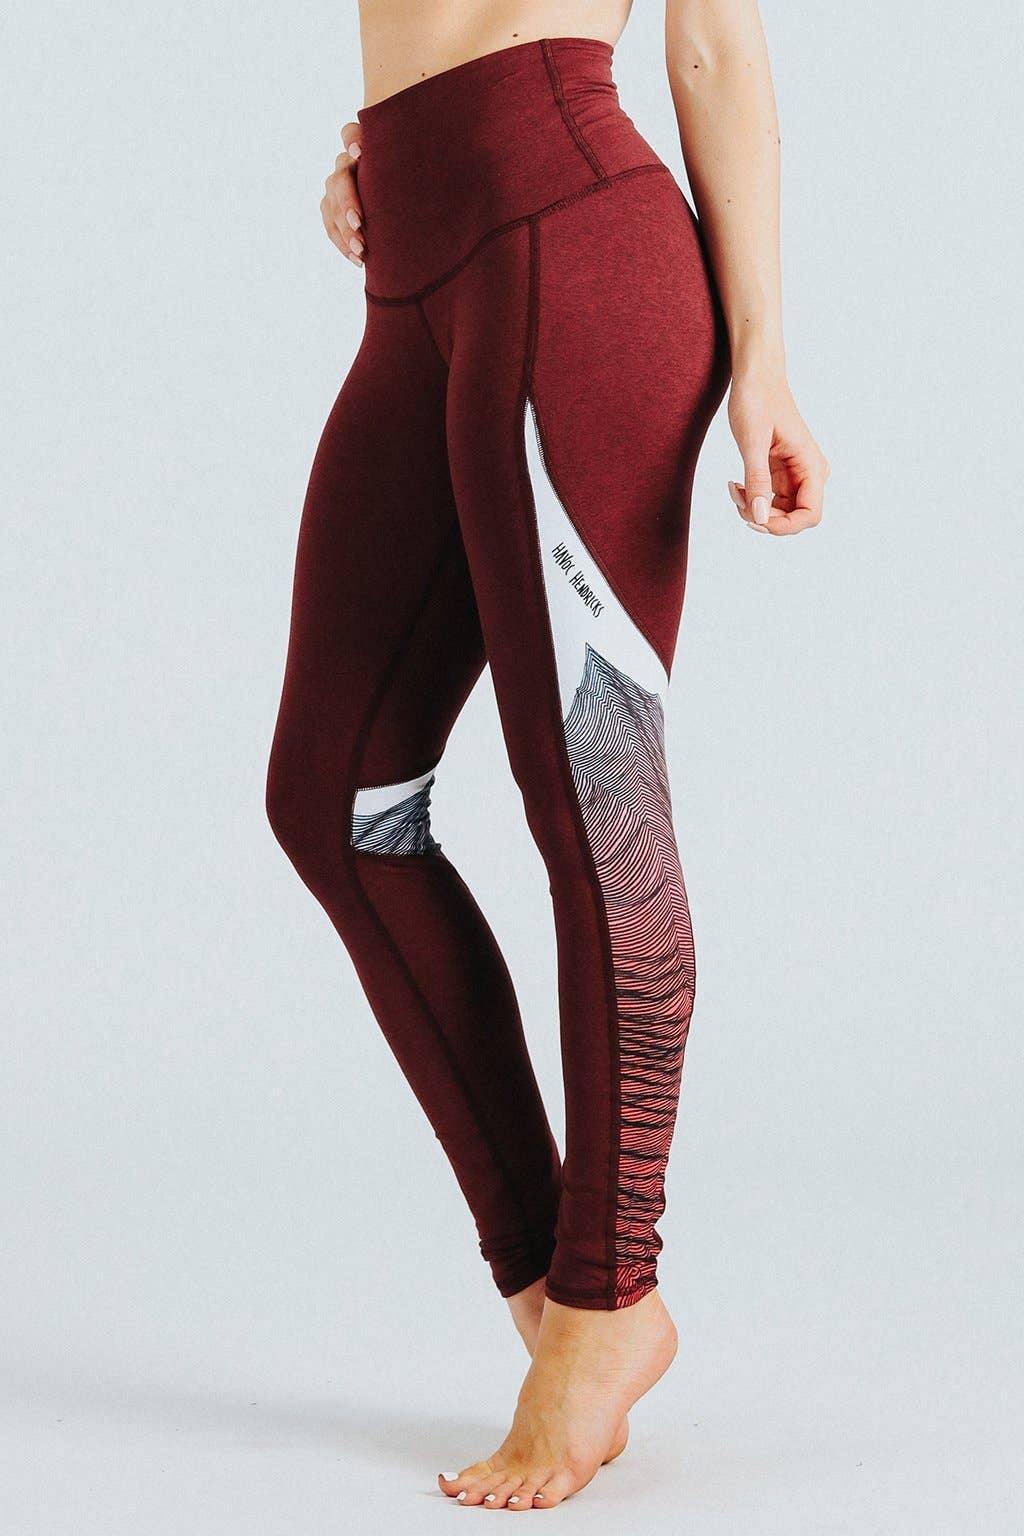 Yogavated Oracle Swoosh Legging Womens Active Workout Yoga Leggings